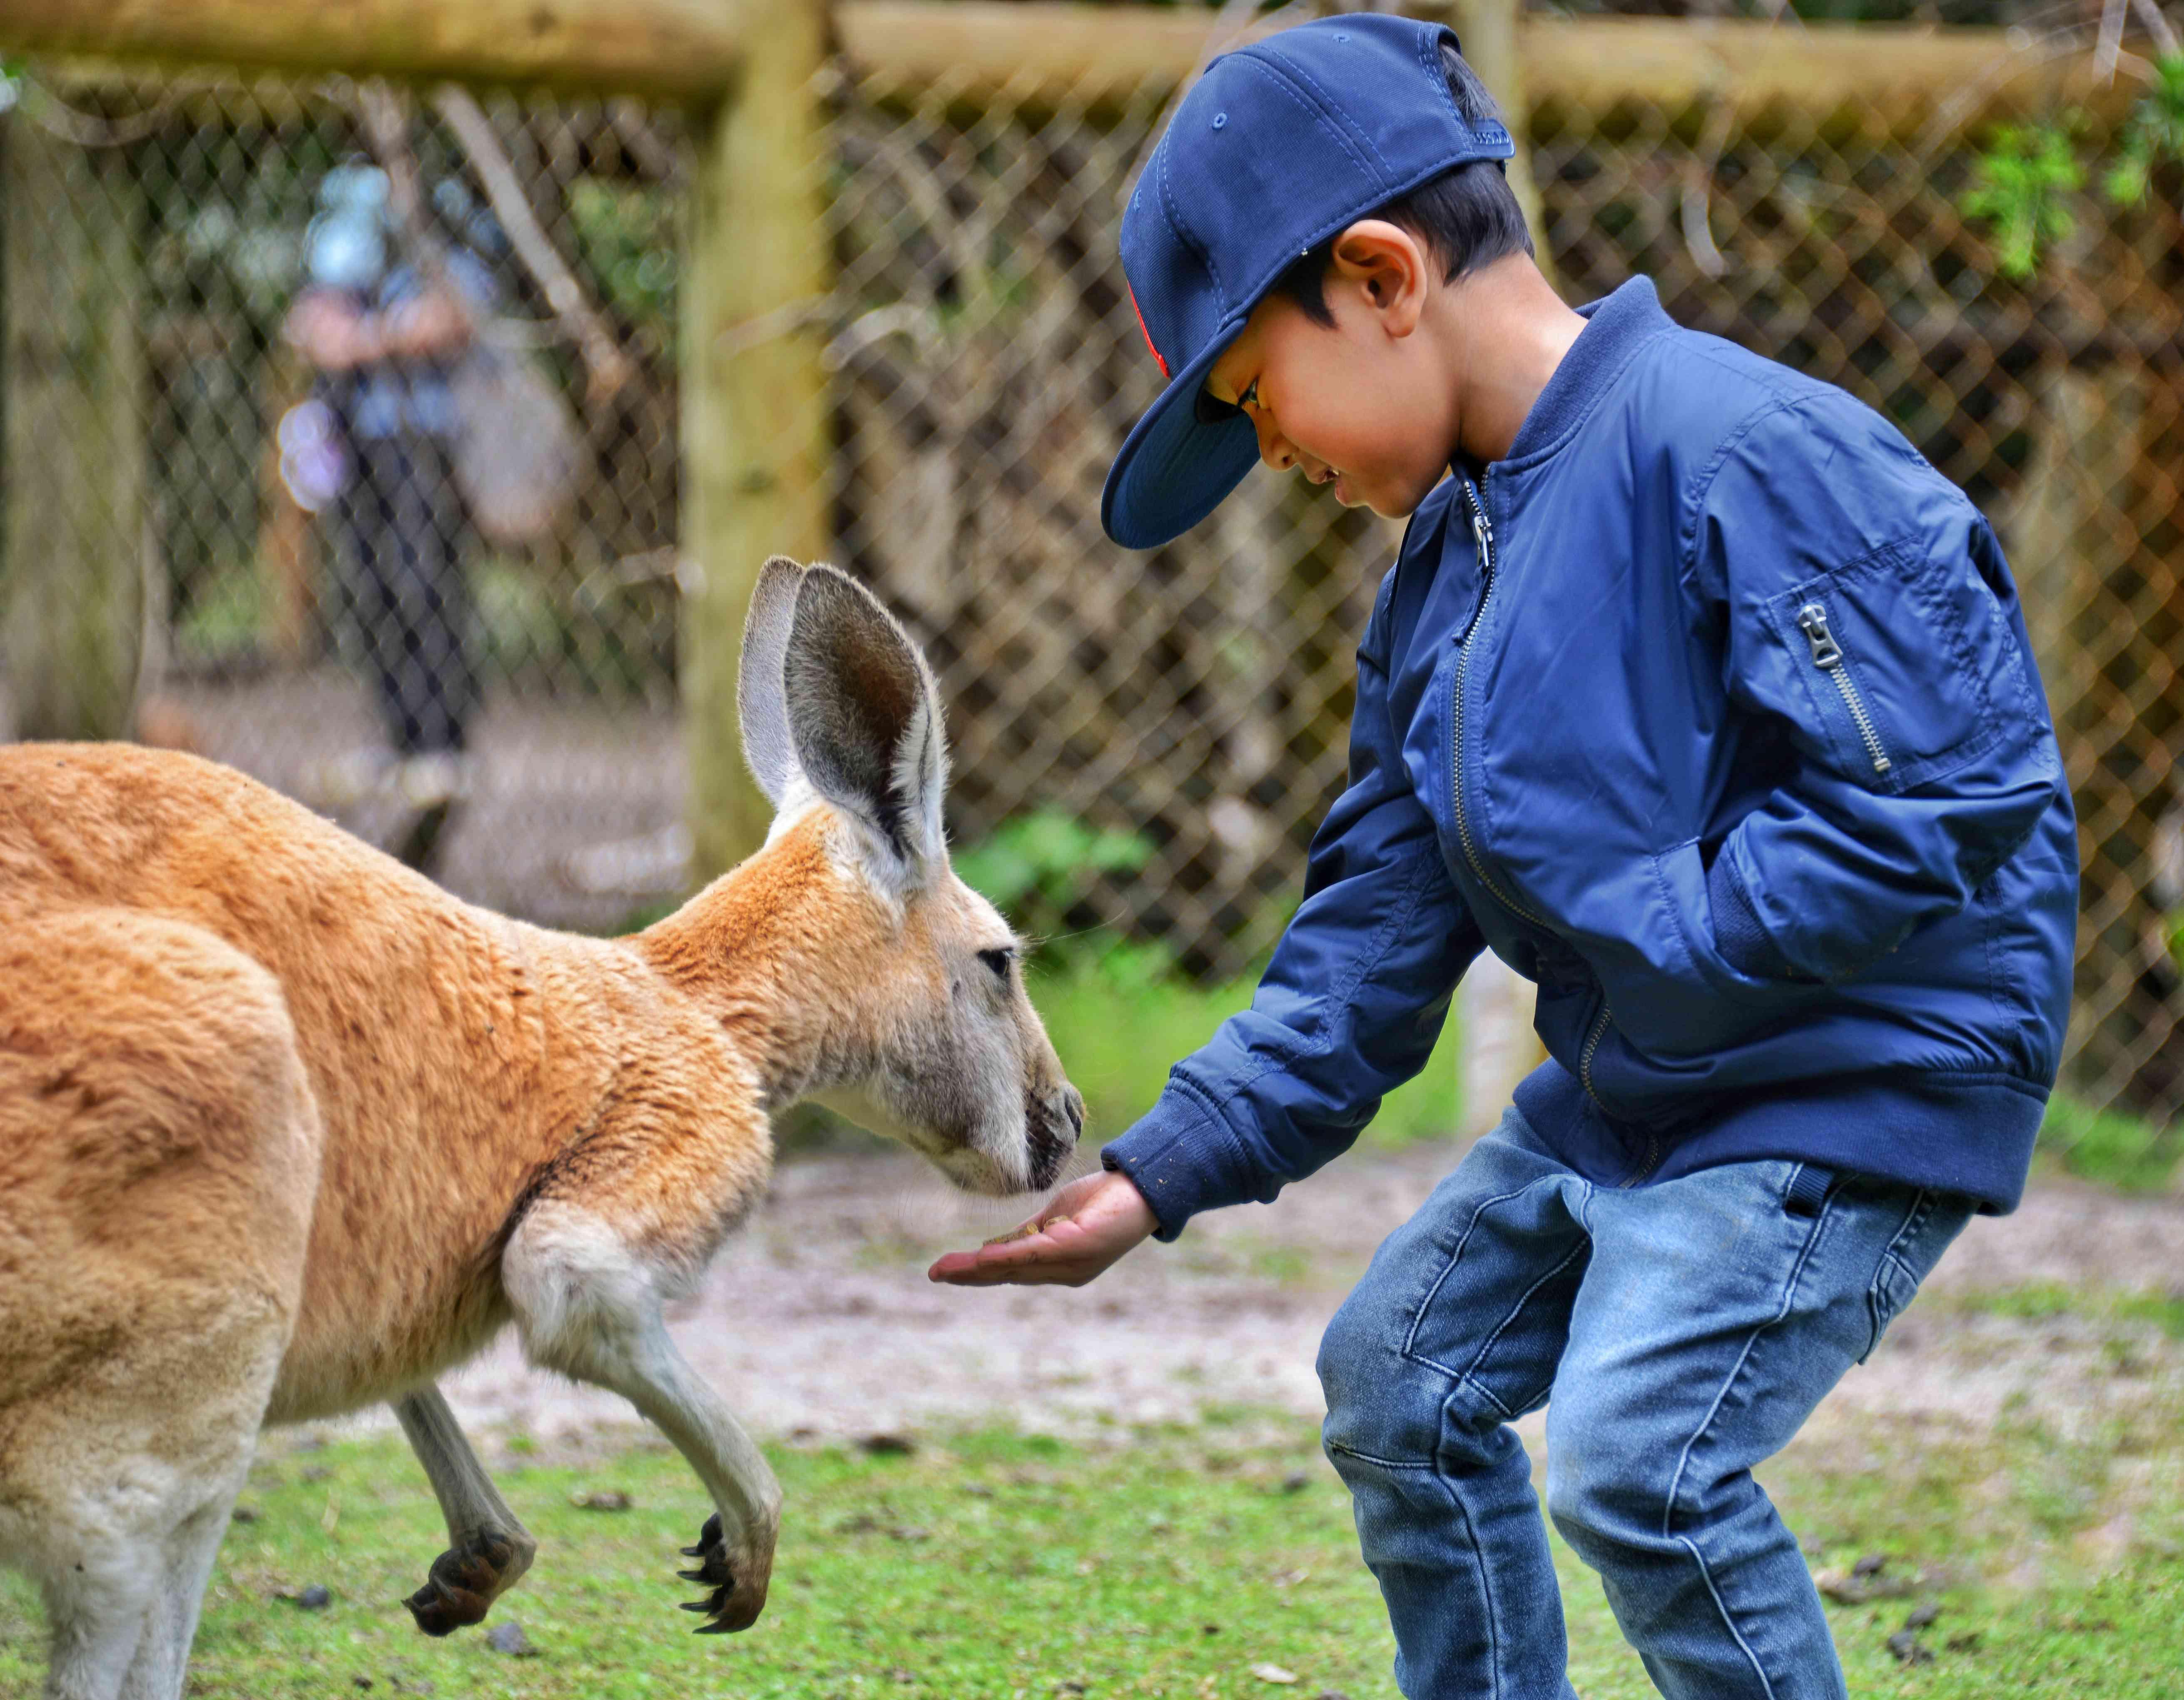 Boy Feeding Kangaroo While Standing At Zoo